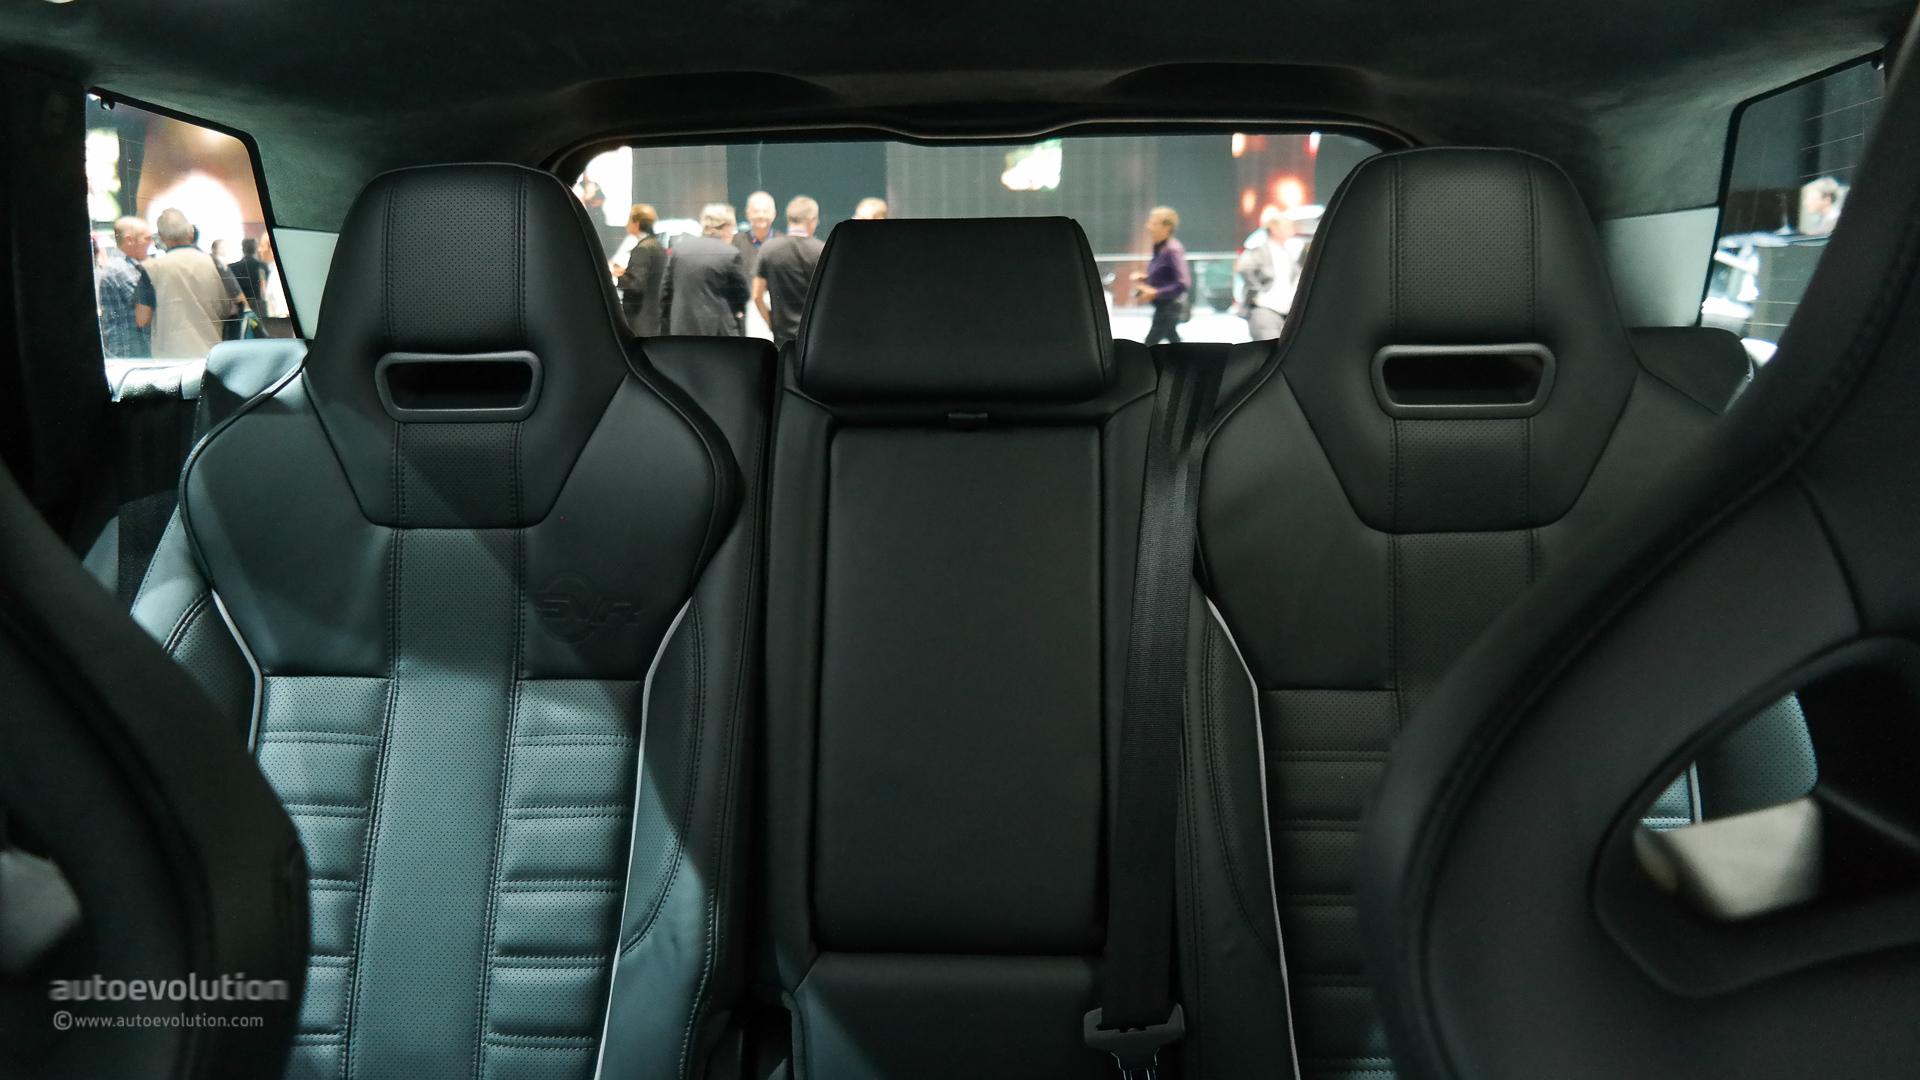 Range Rover Sport SVR Brings Its Supercharged V8 to Paris [Live